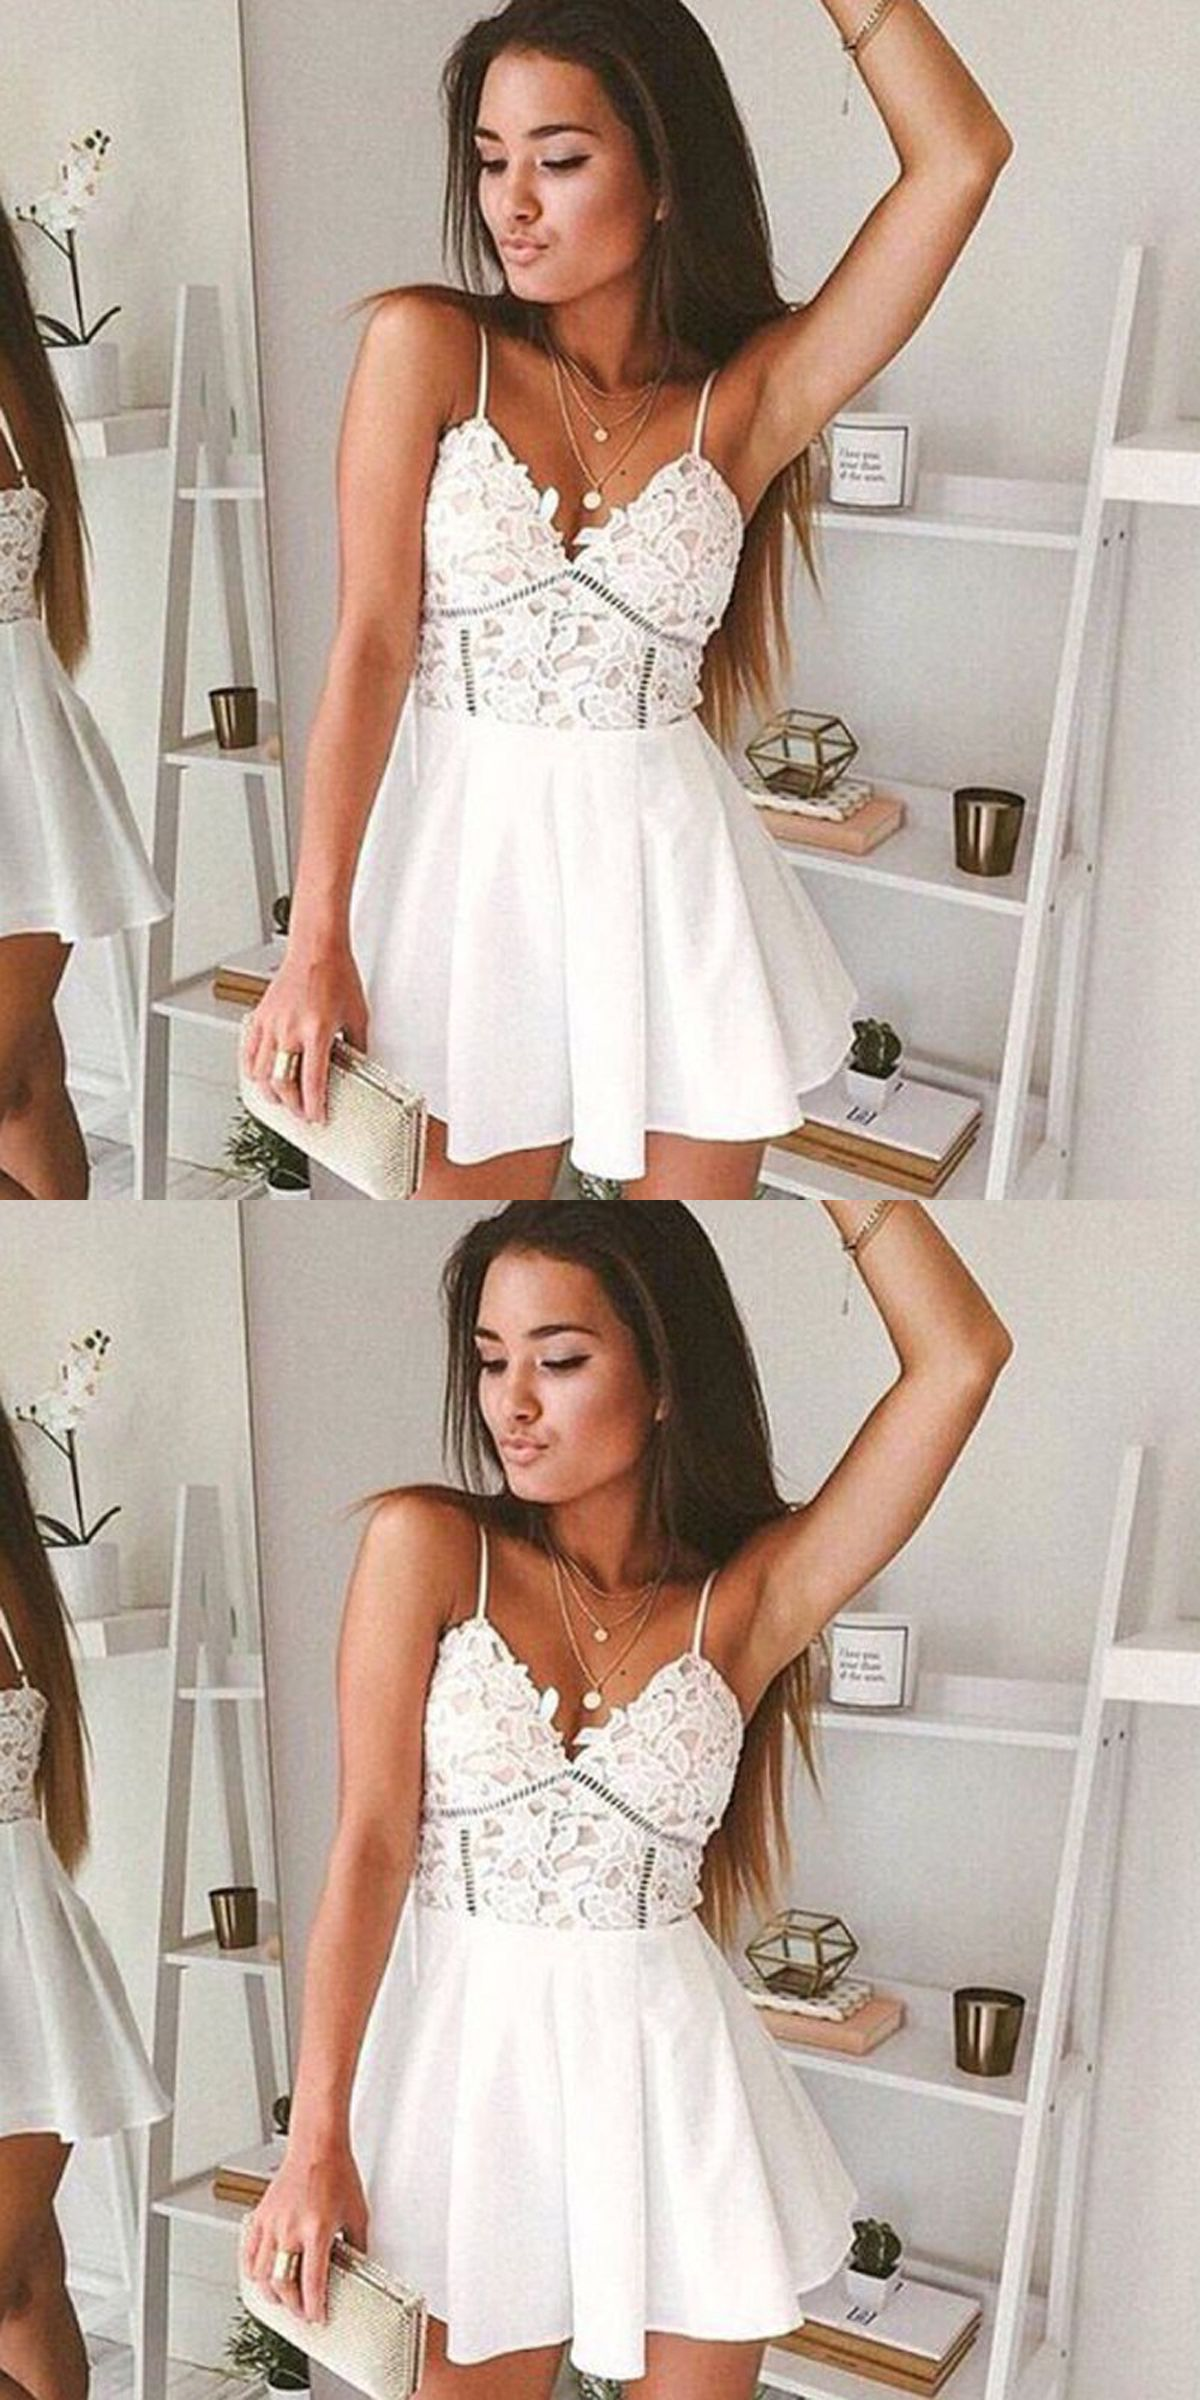 3c08e039165b A-Line Spaghetti Straps White Chiffon Mini Homecoming Dress with Lace